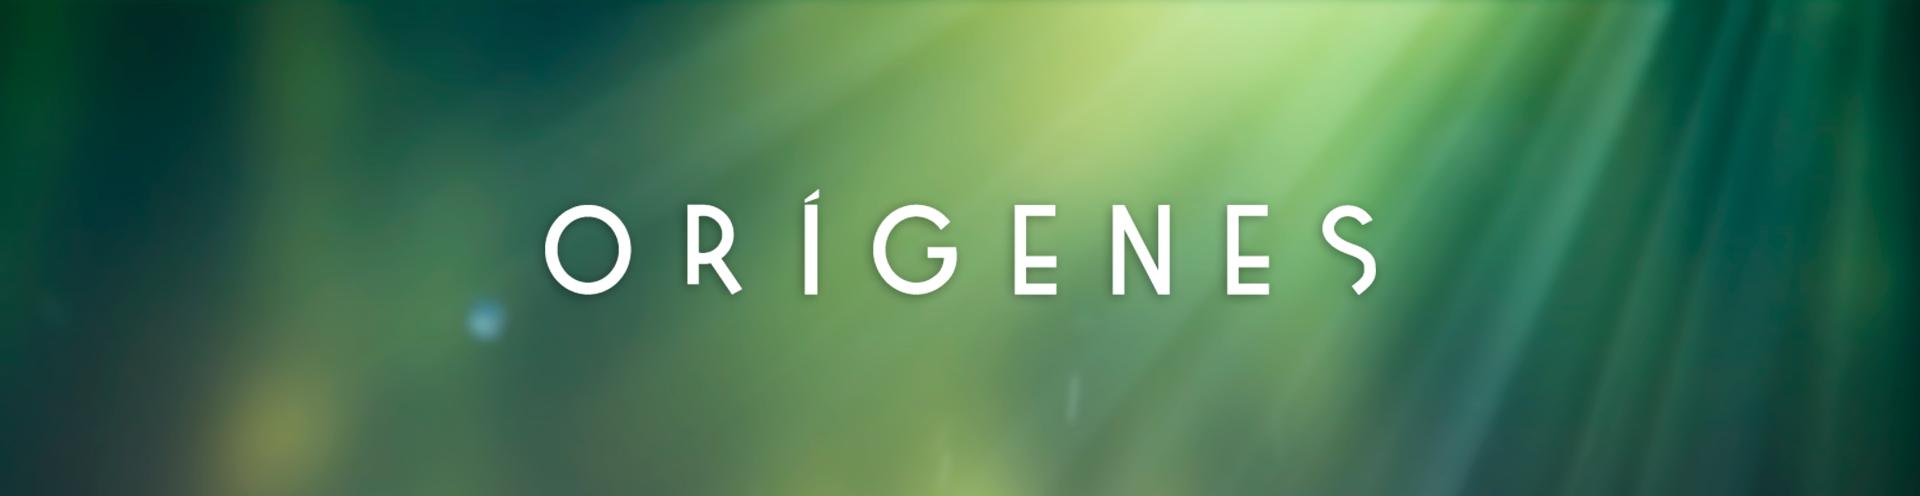 ORIGENES - NT Play